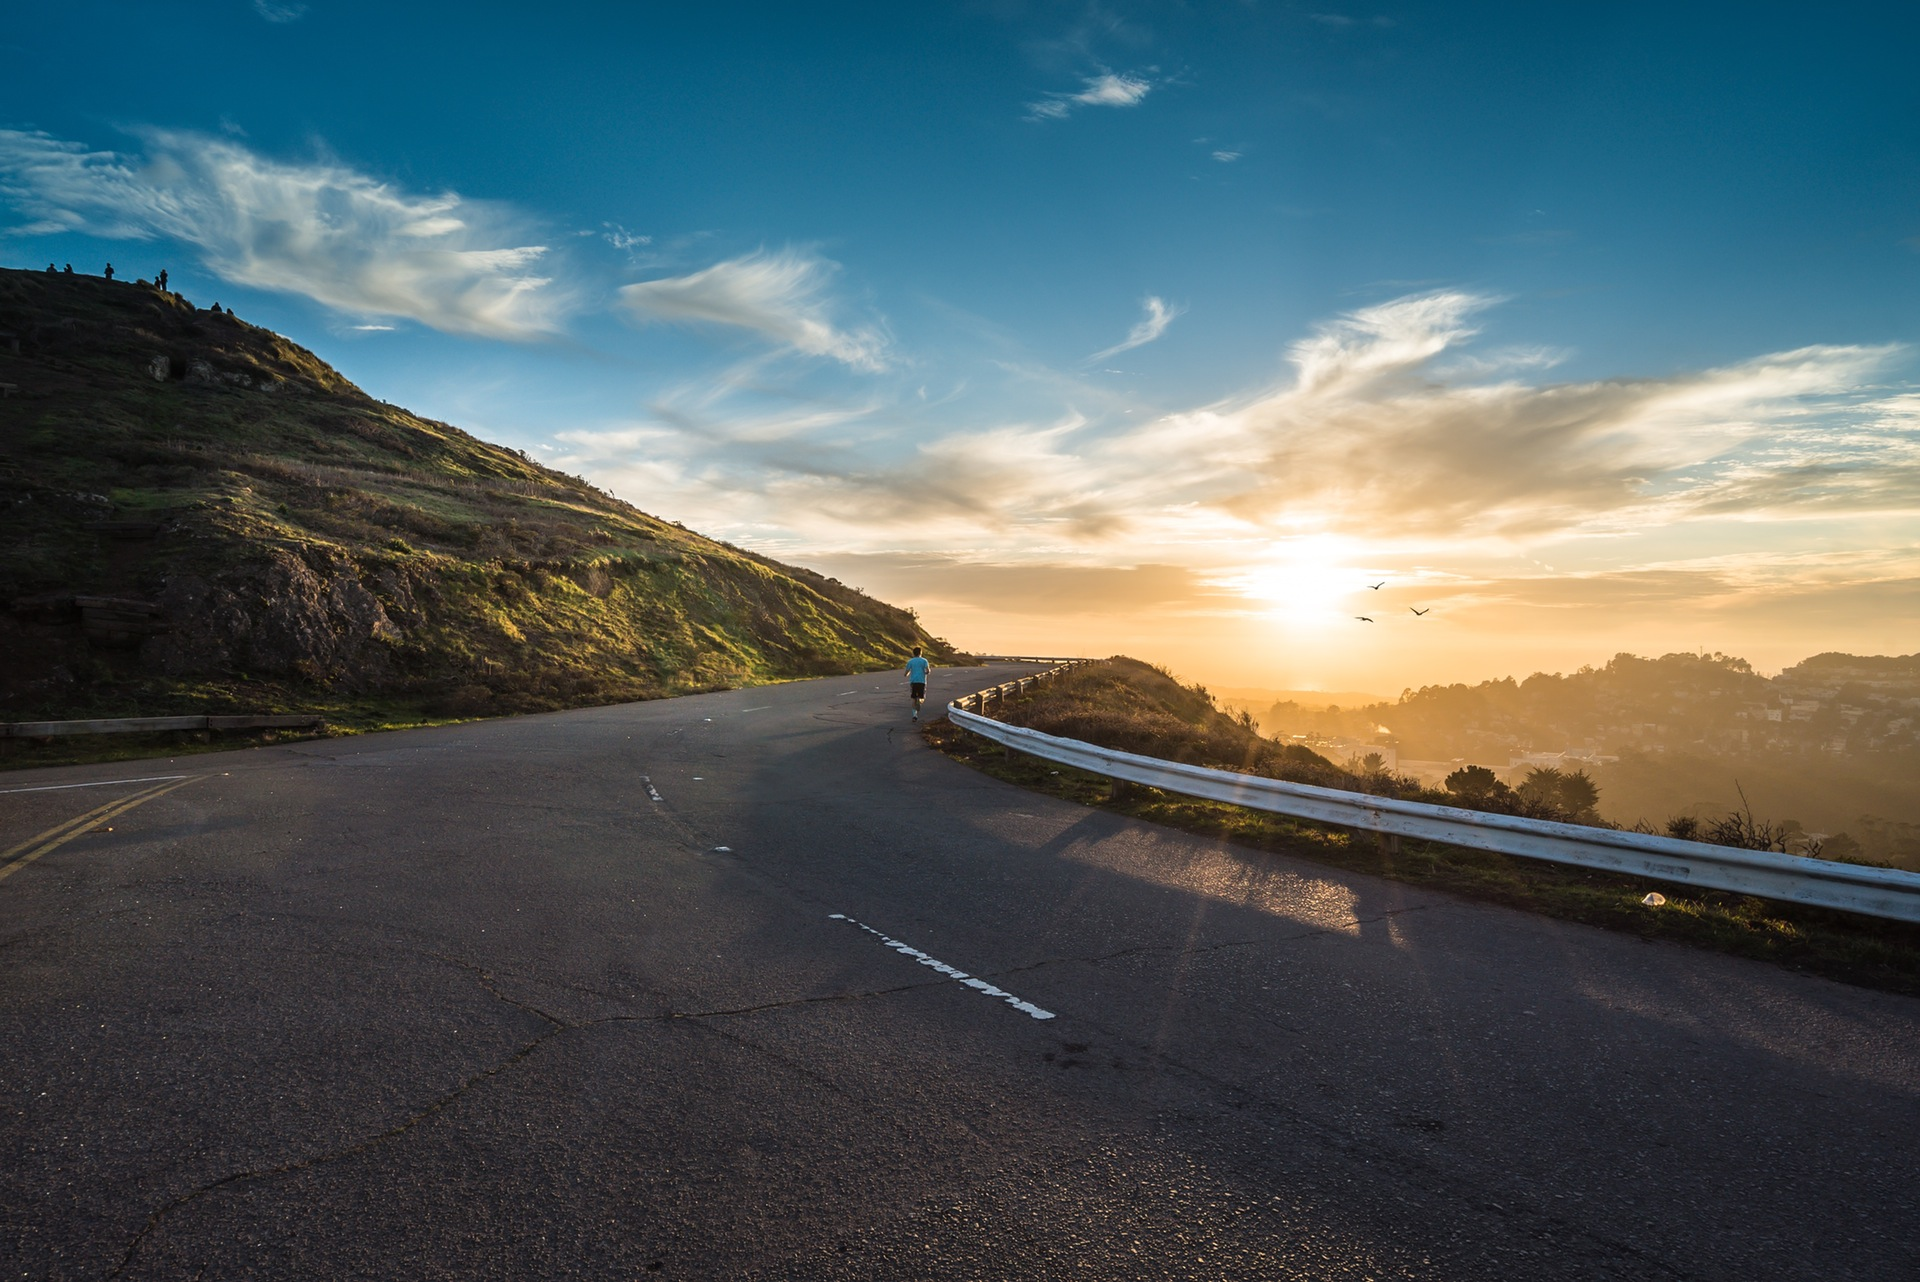 carretera, amanecer, corredor, montañas, cielo, nubes, curvas, running, runner - Fondos de Pantalla HD - professor-falken.com